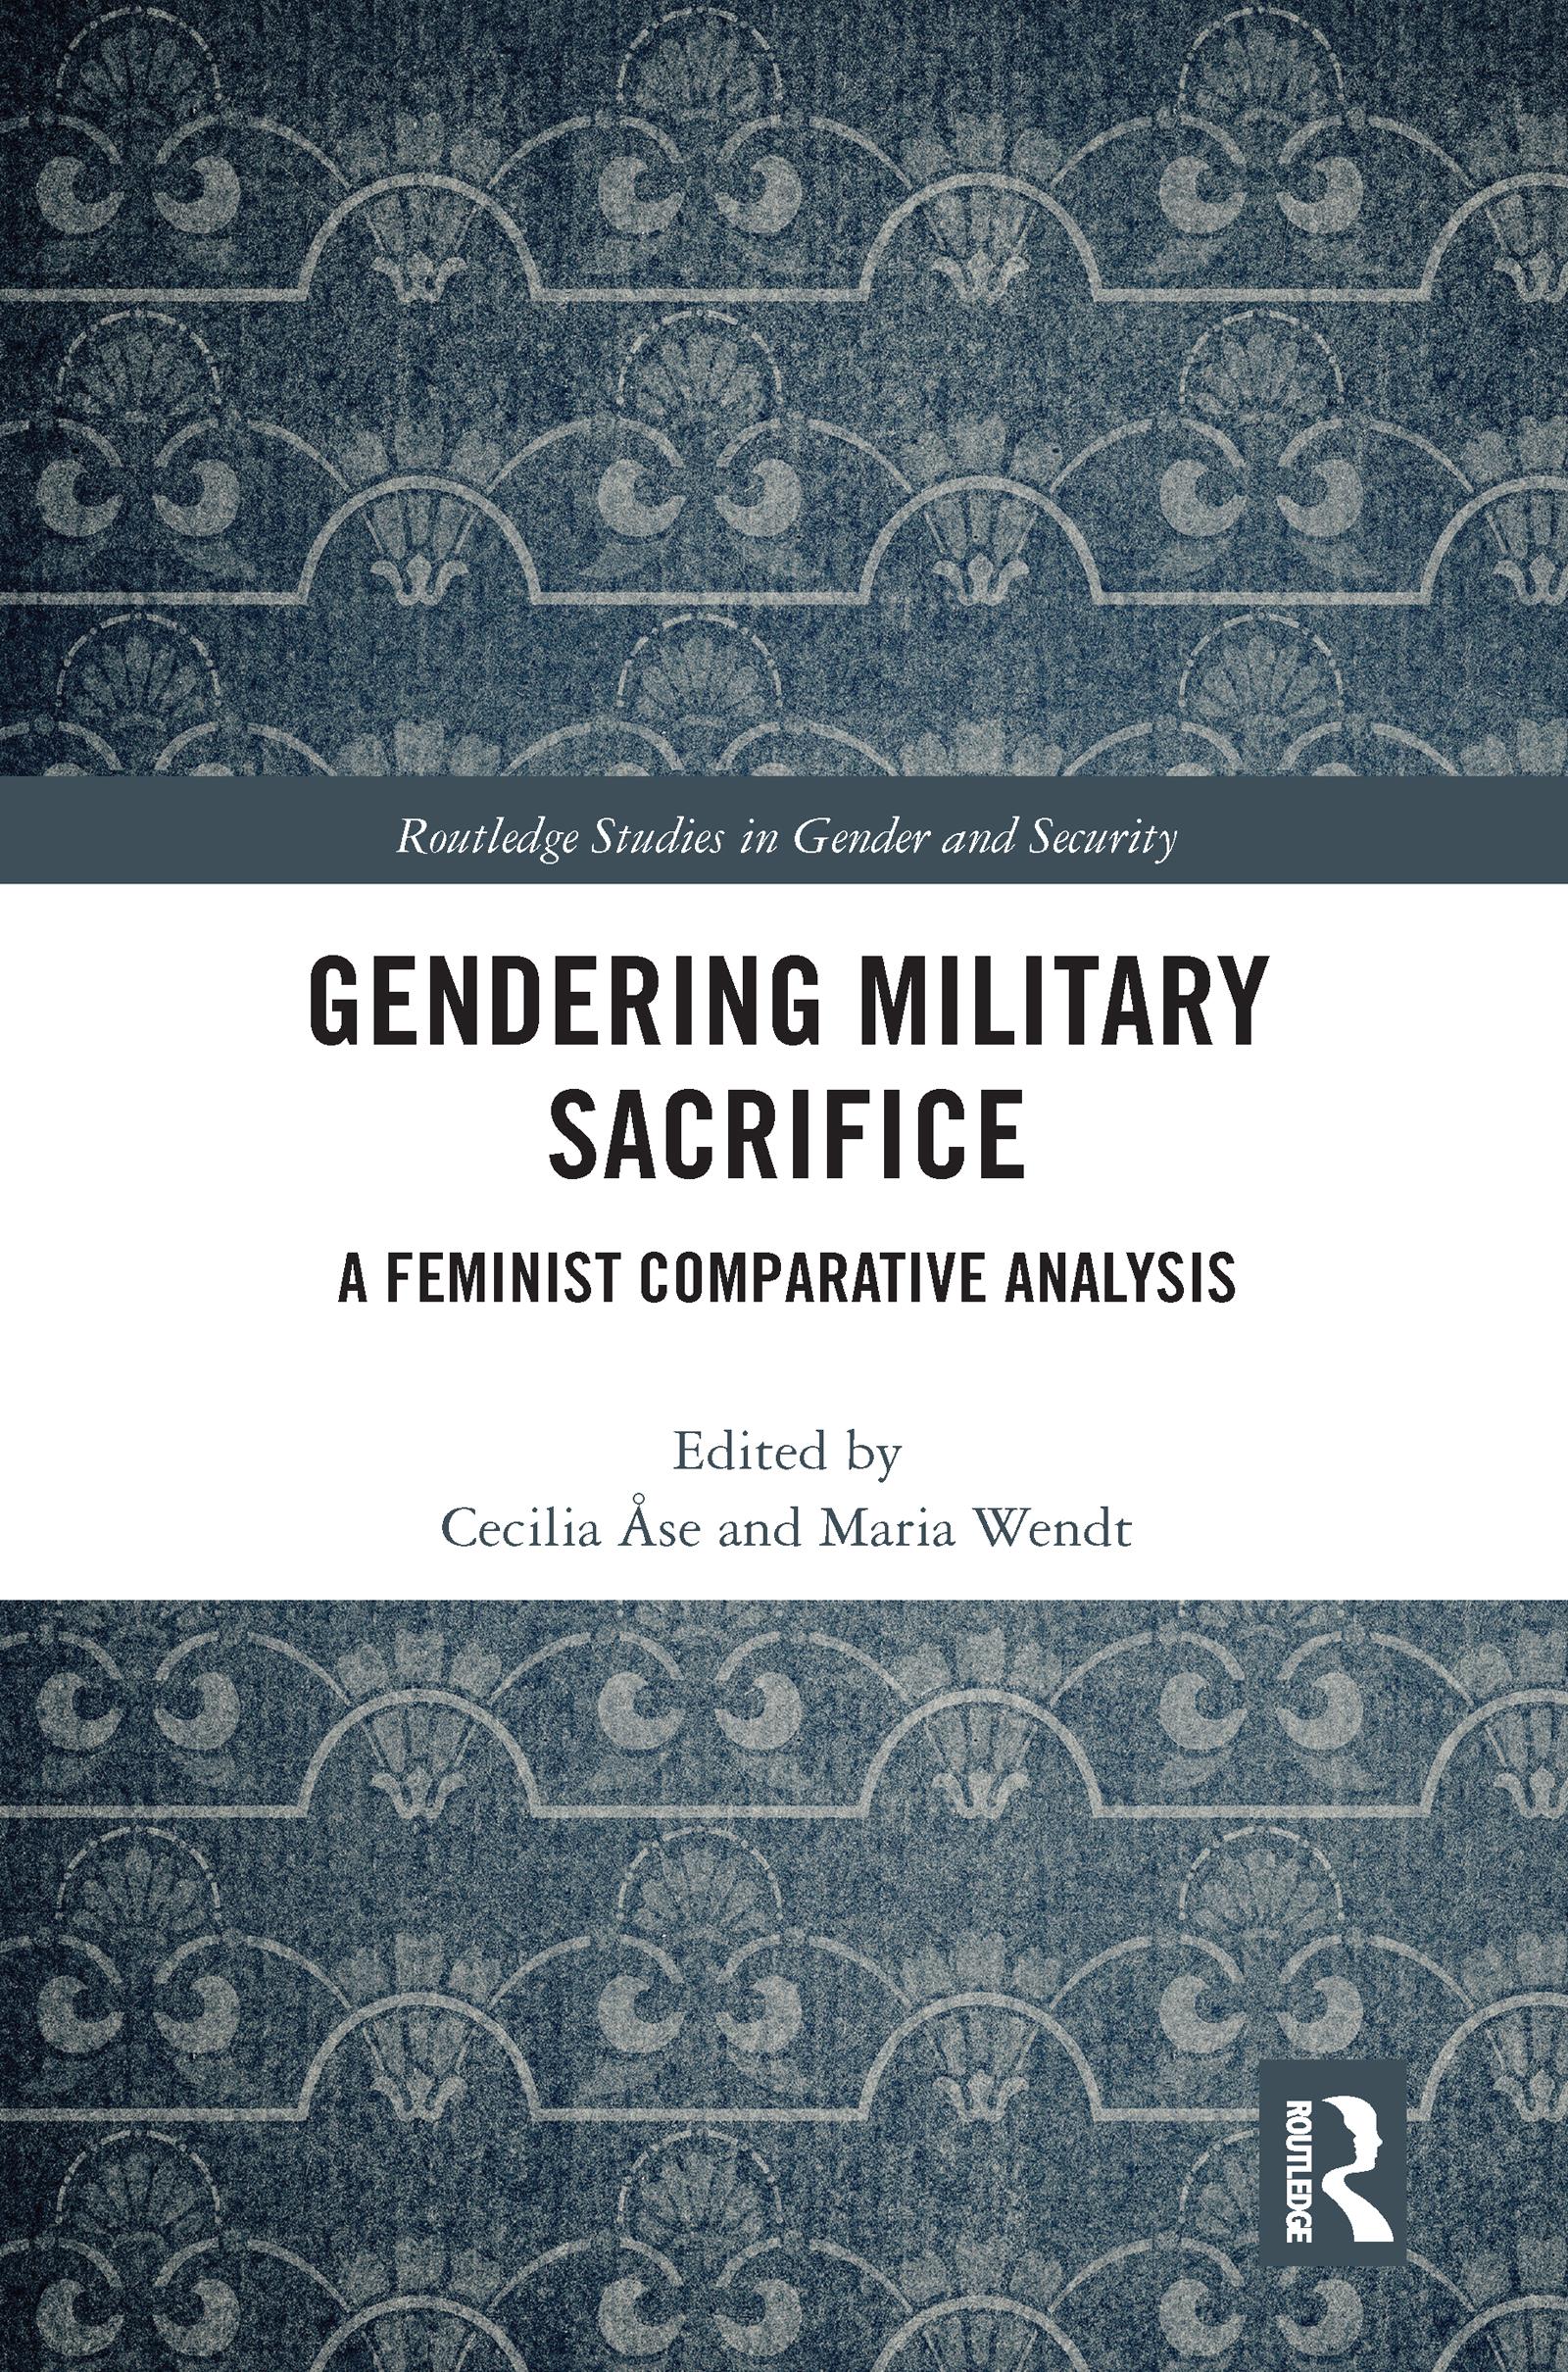 Gendering Military Sacrifice